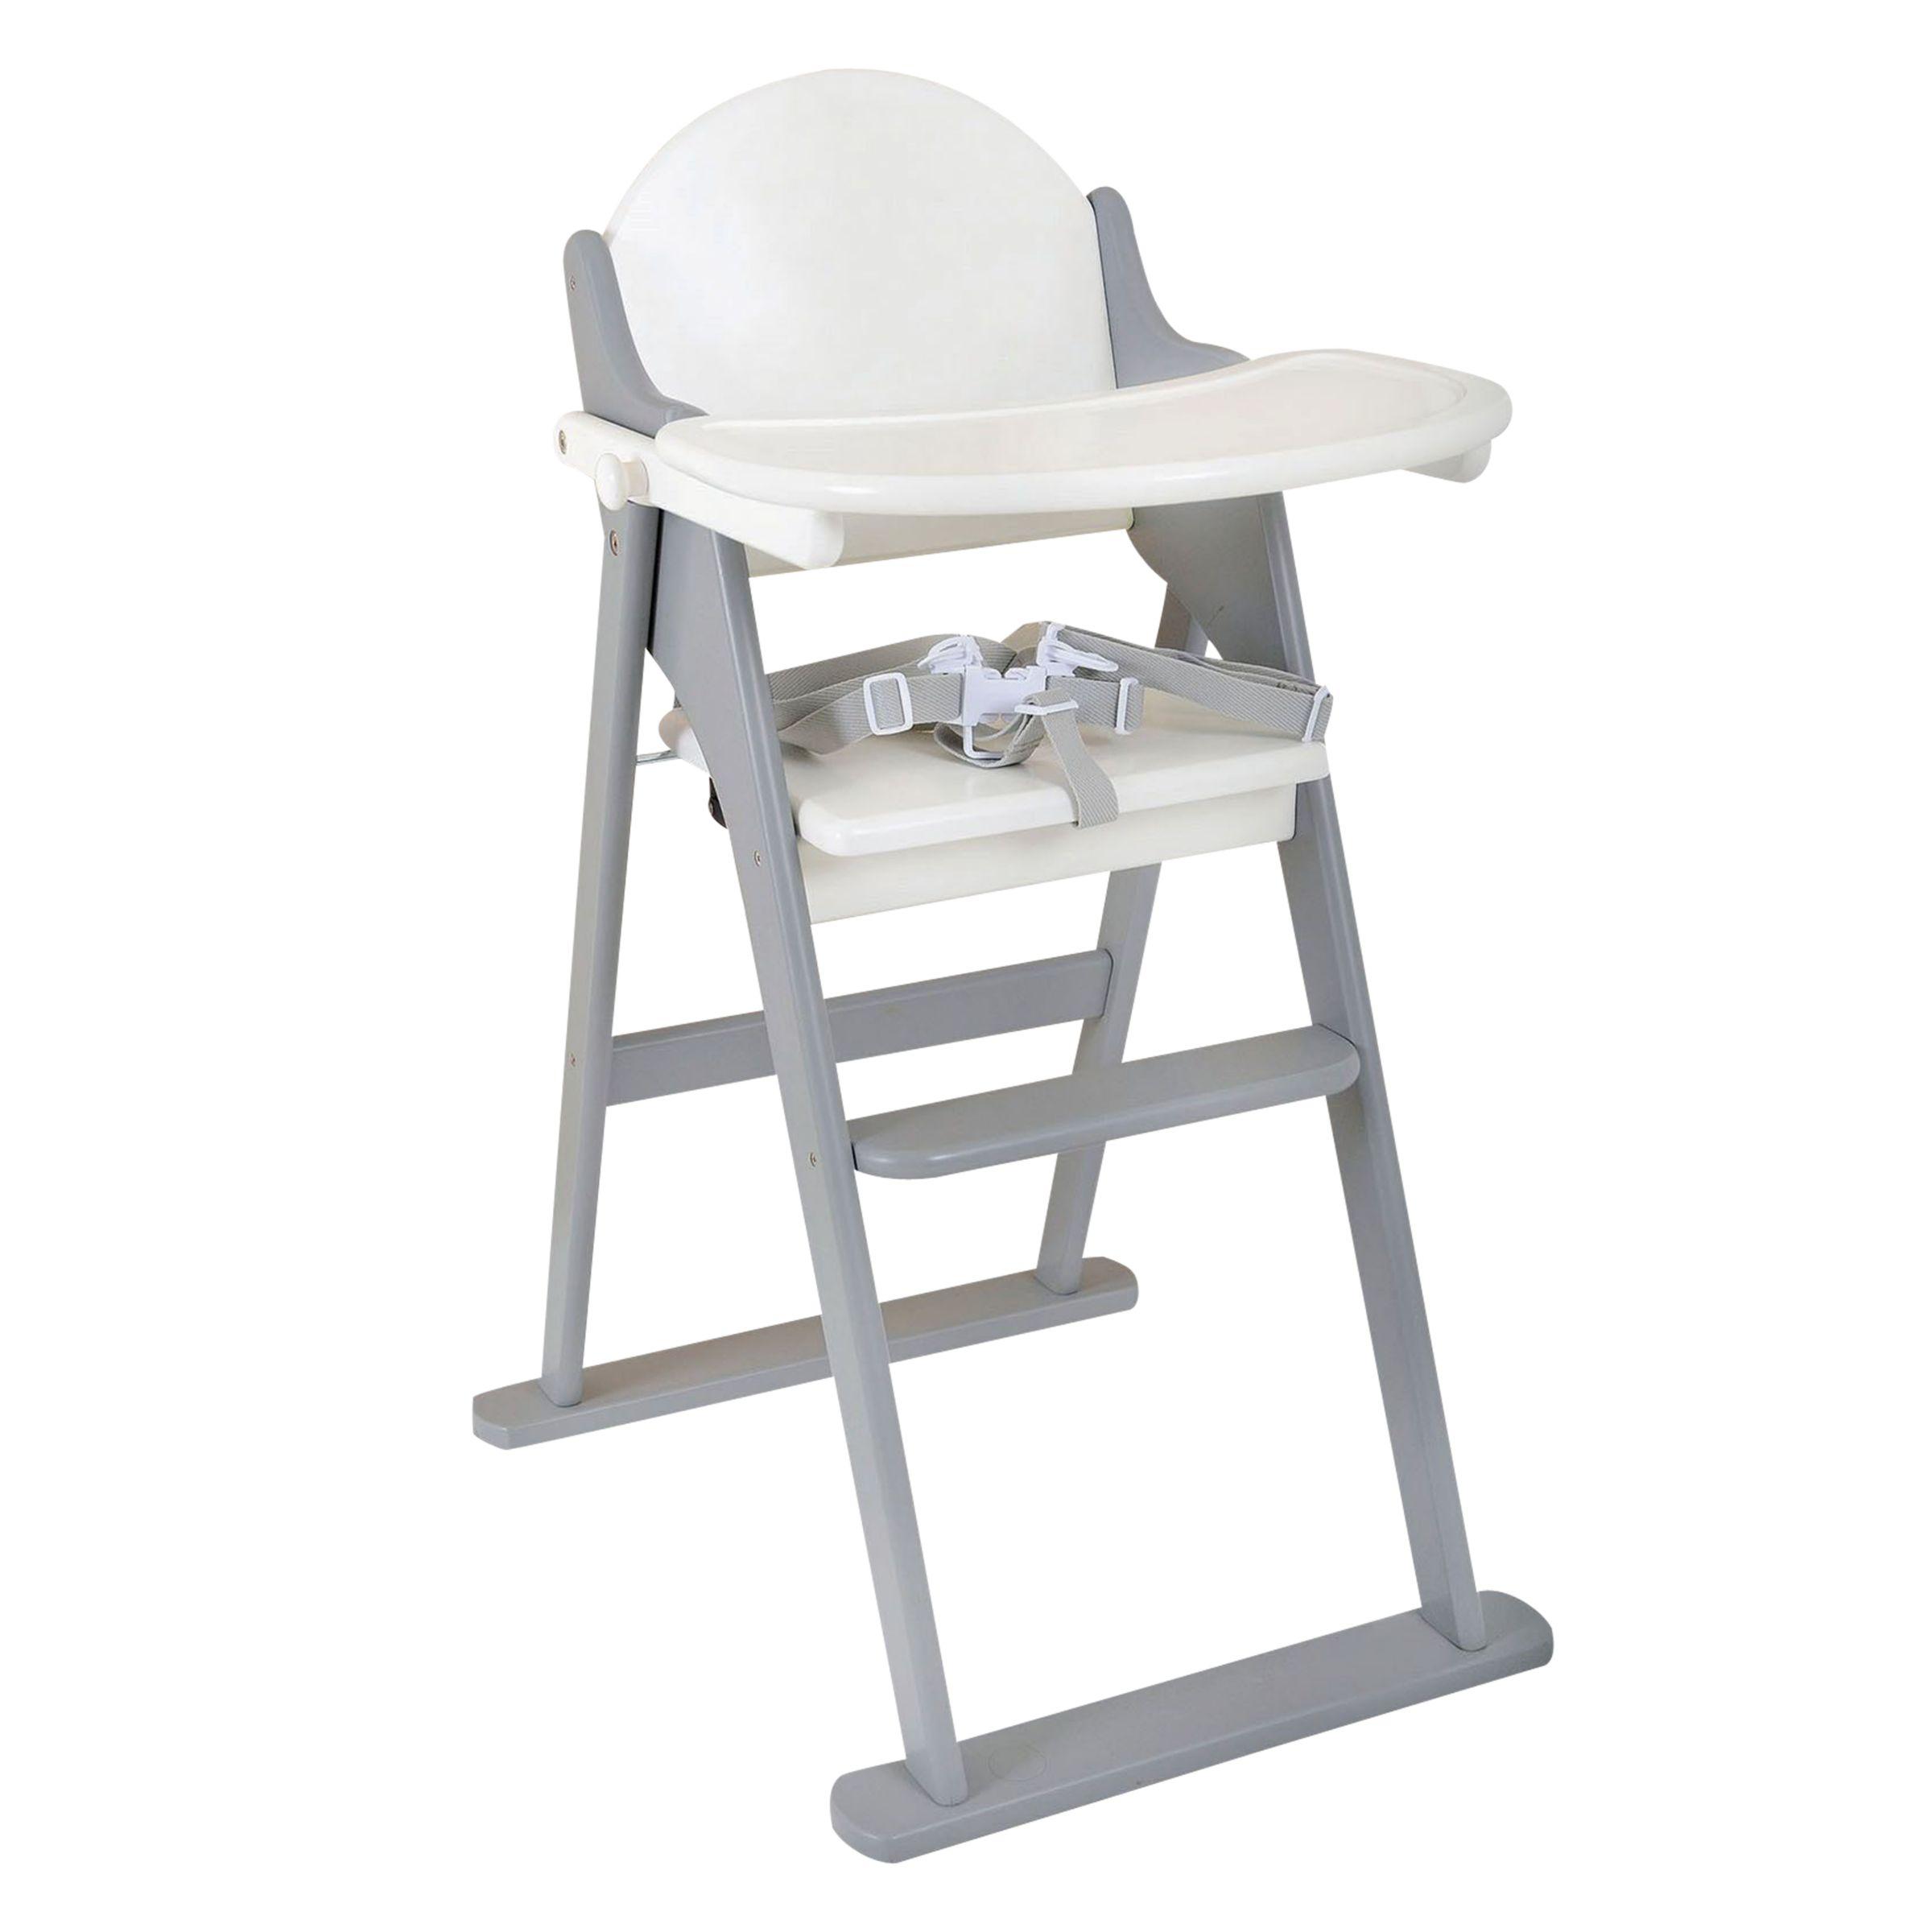 East Coast East Coast Folding Highchair, Grey/White